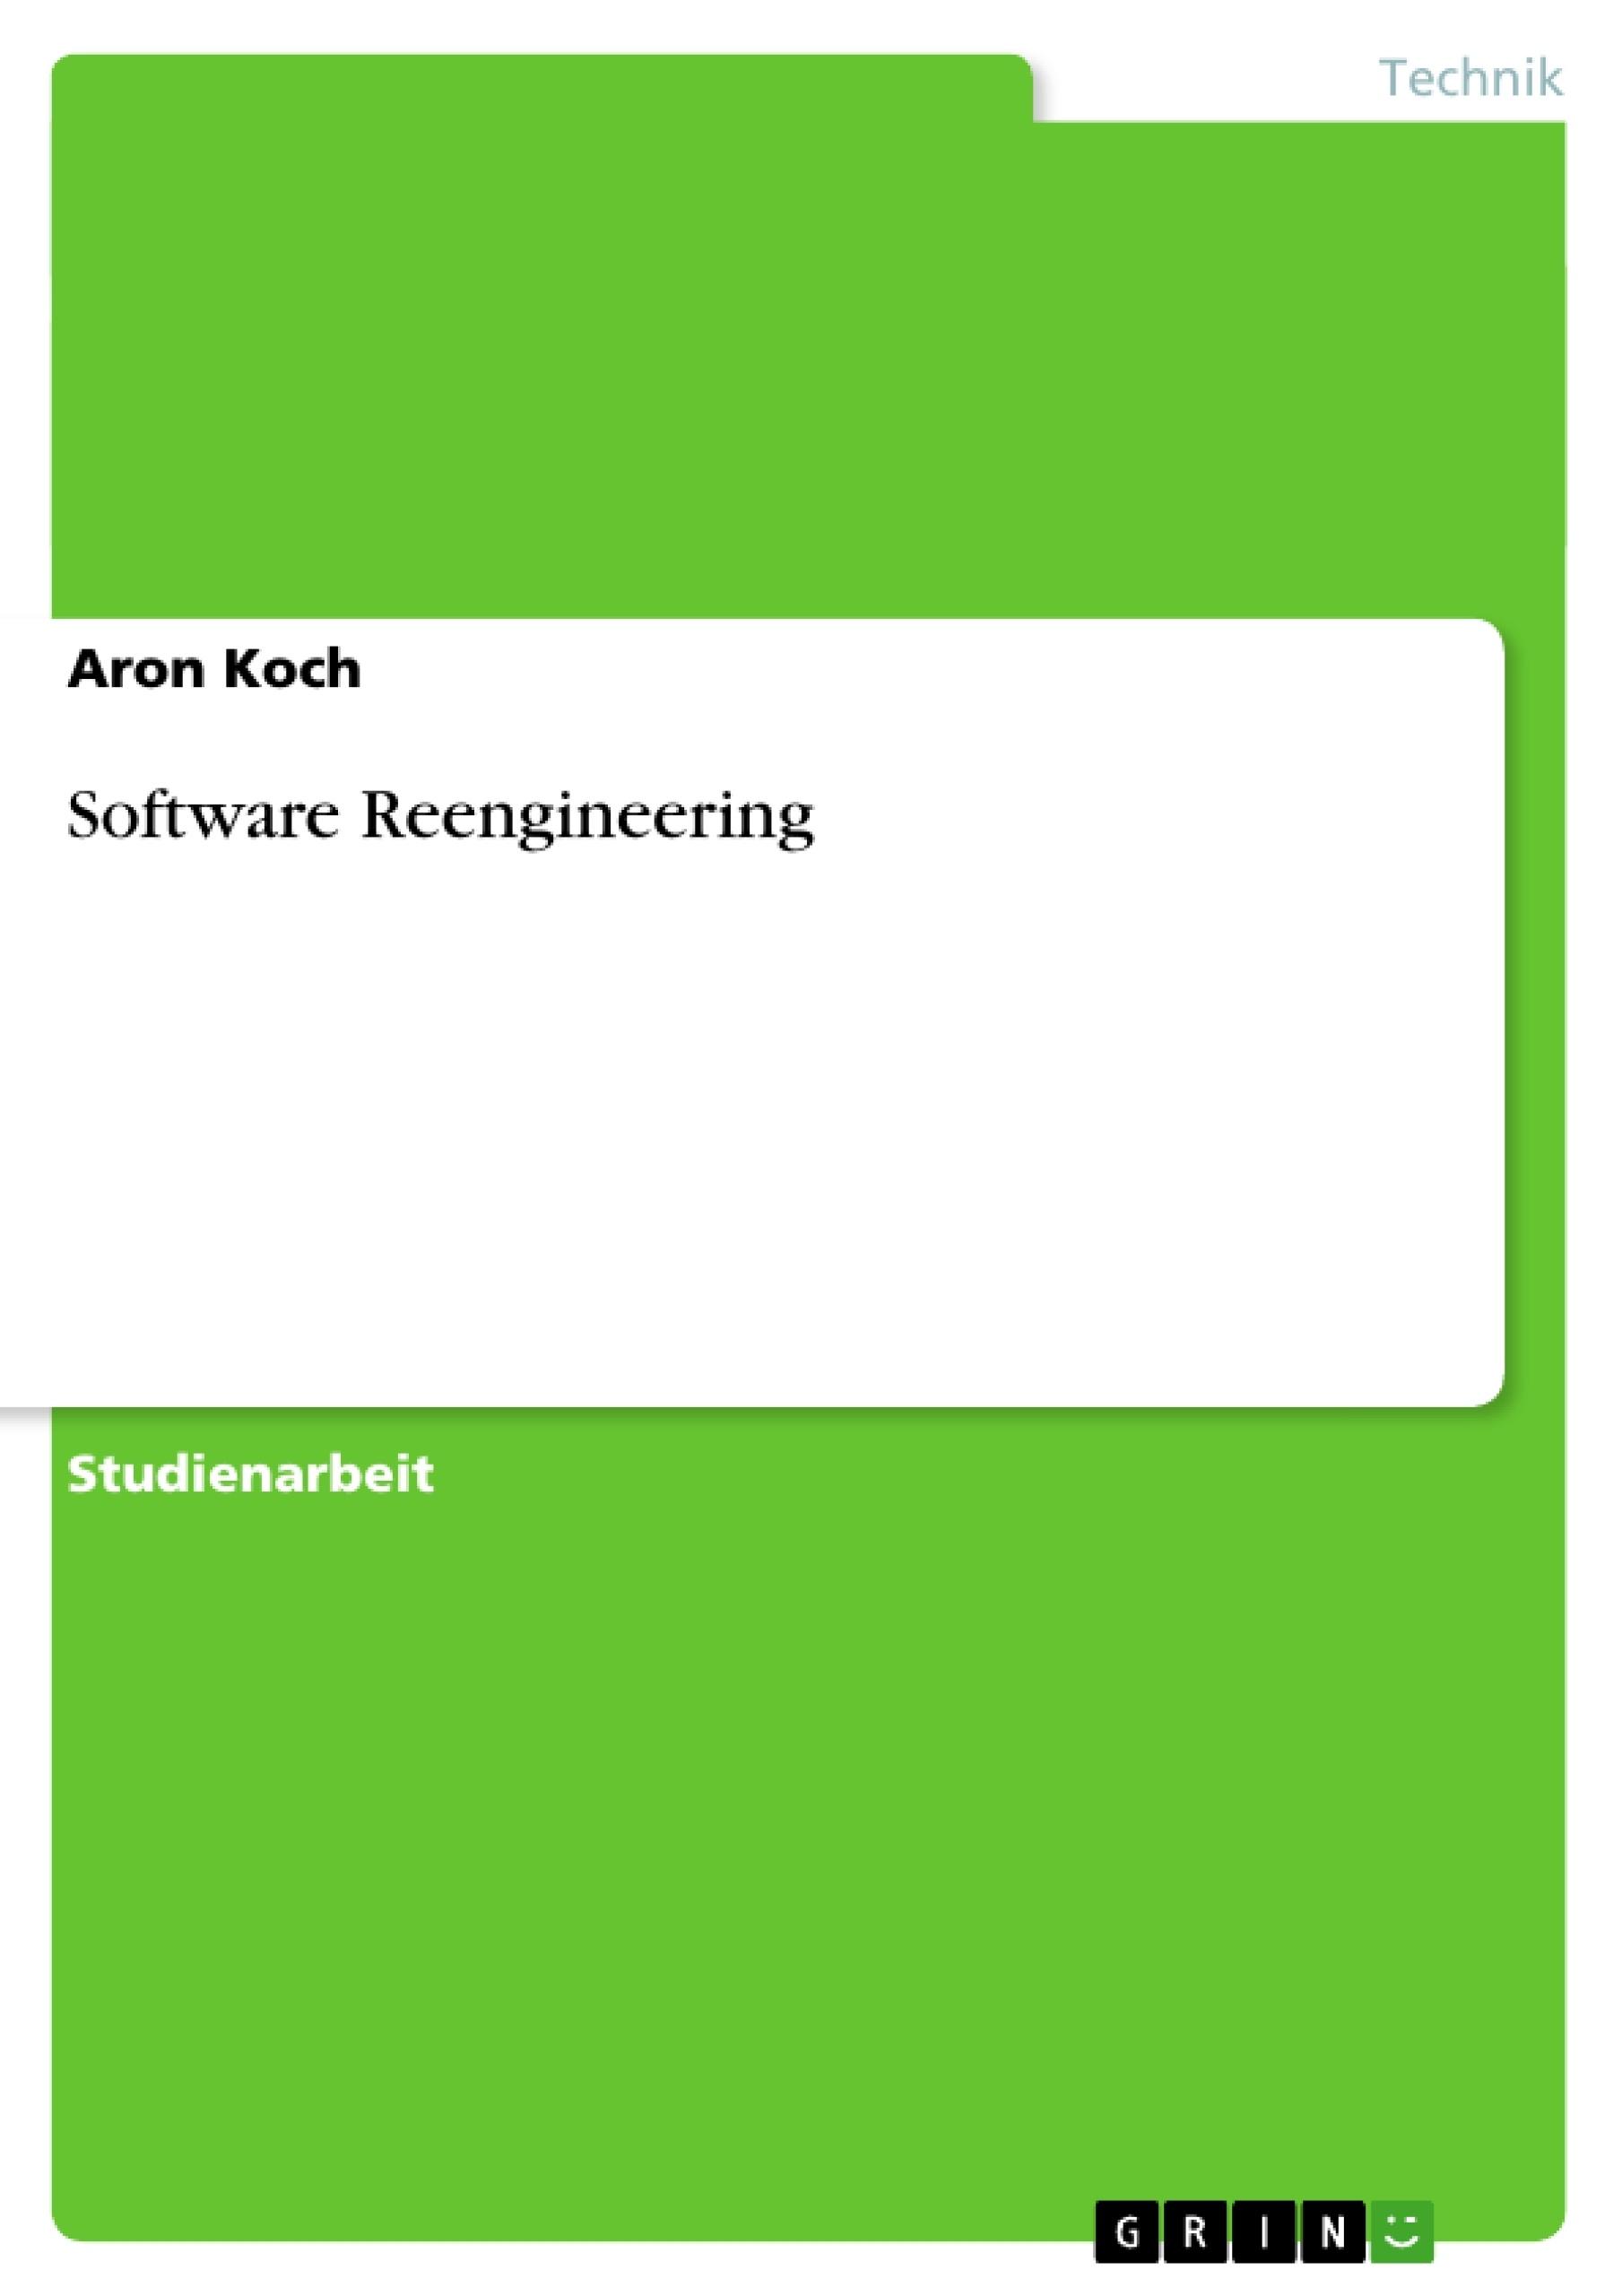 Titel: Software Reengineering